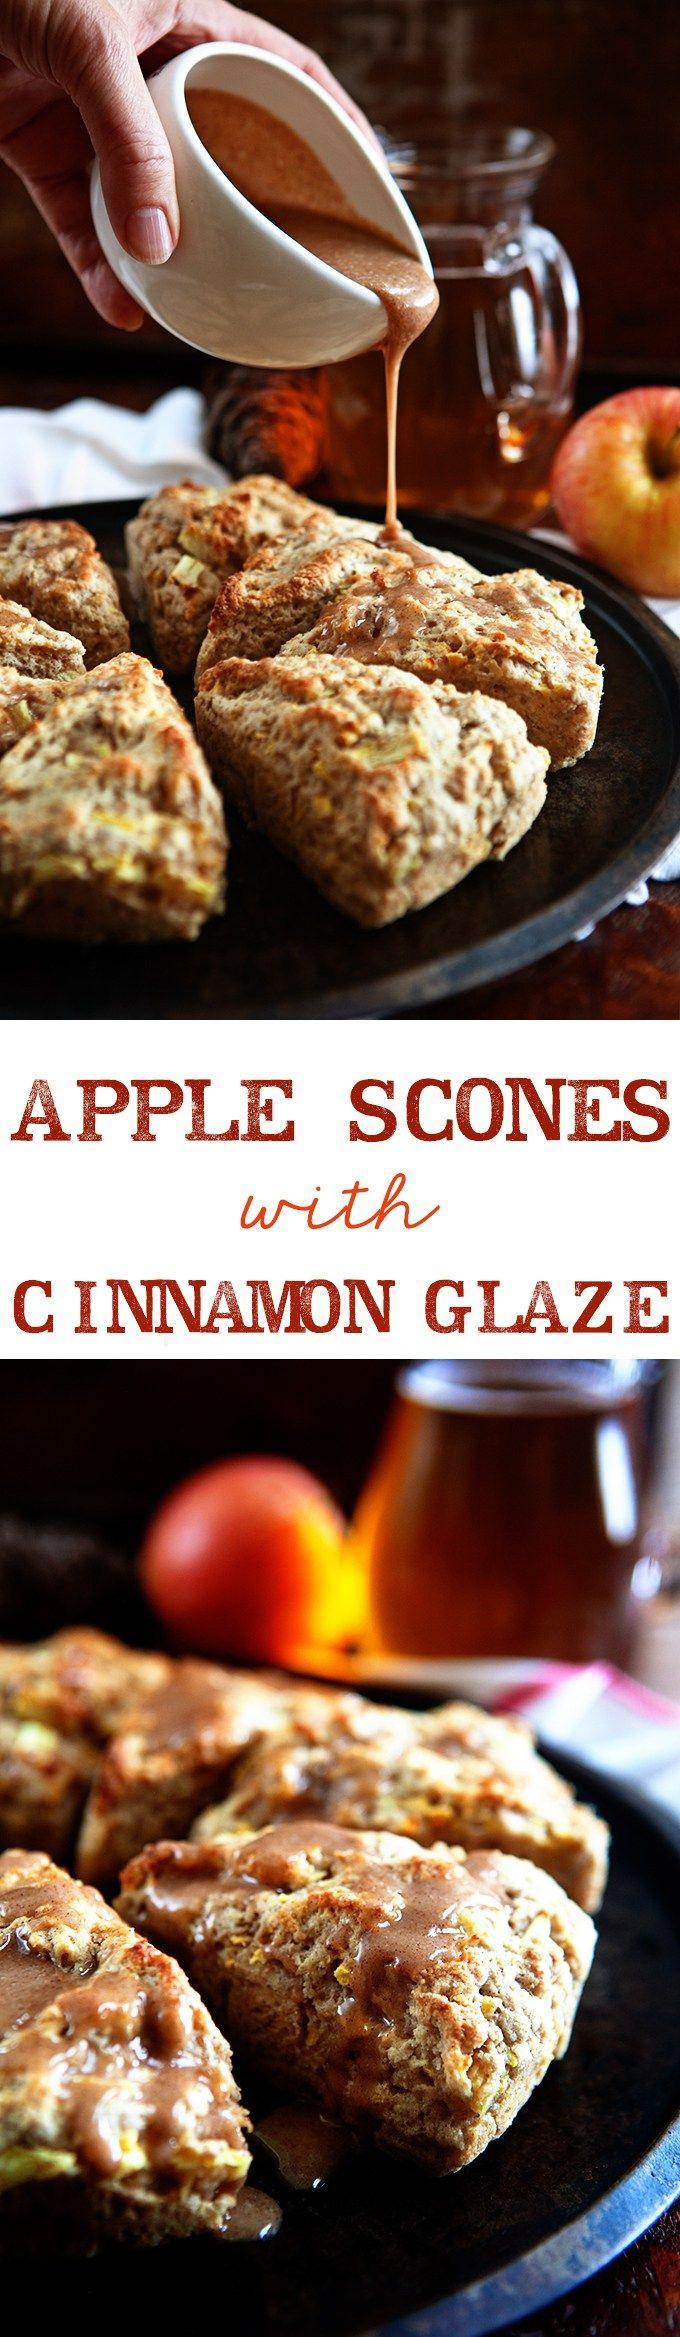 Apple Scones with Apple Cider Cinnamon Glaze - Some the Wiser